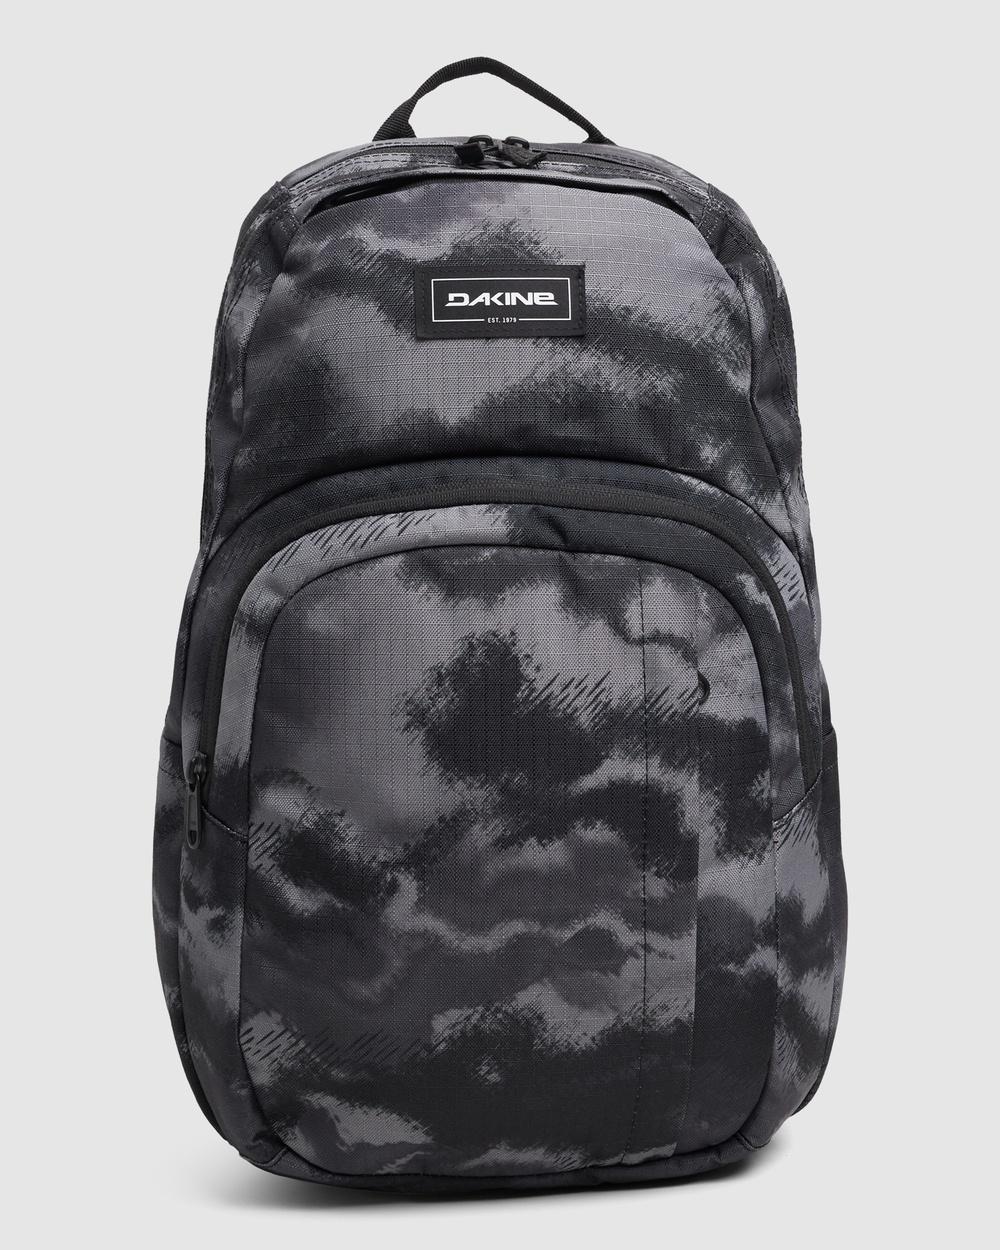 Dakine Campus M 25 L Backpack Backpacks DK ASH CAMO